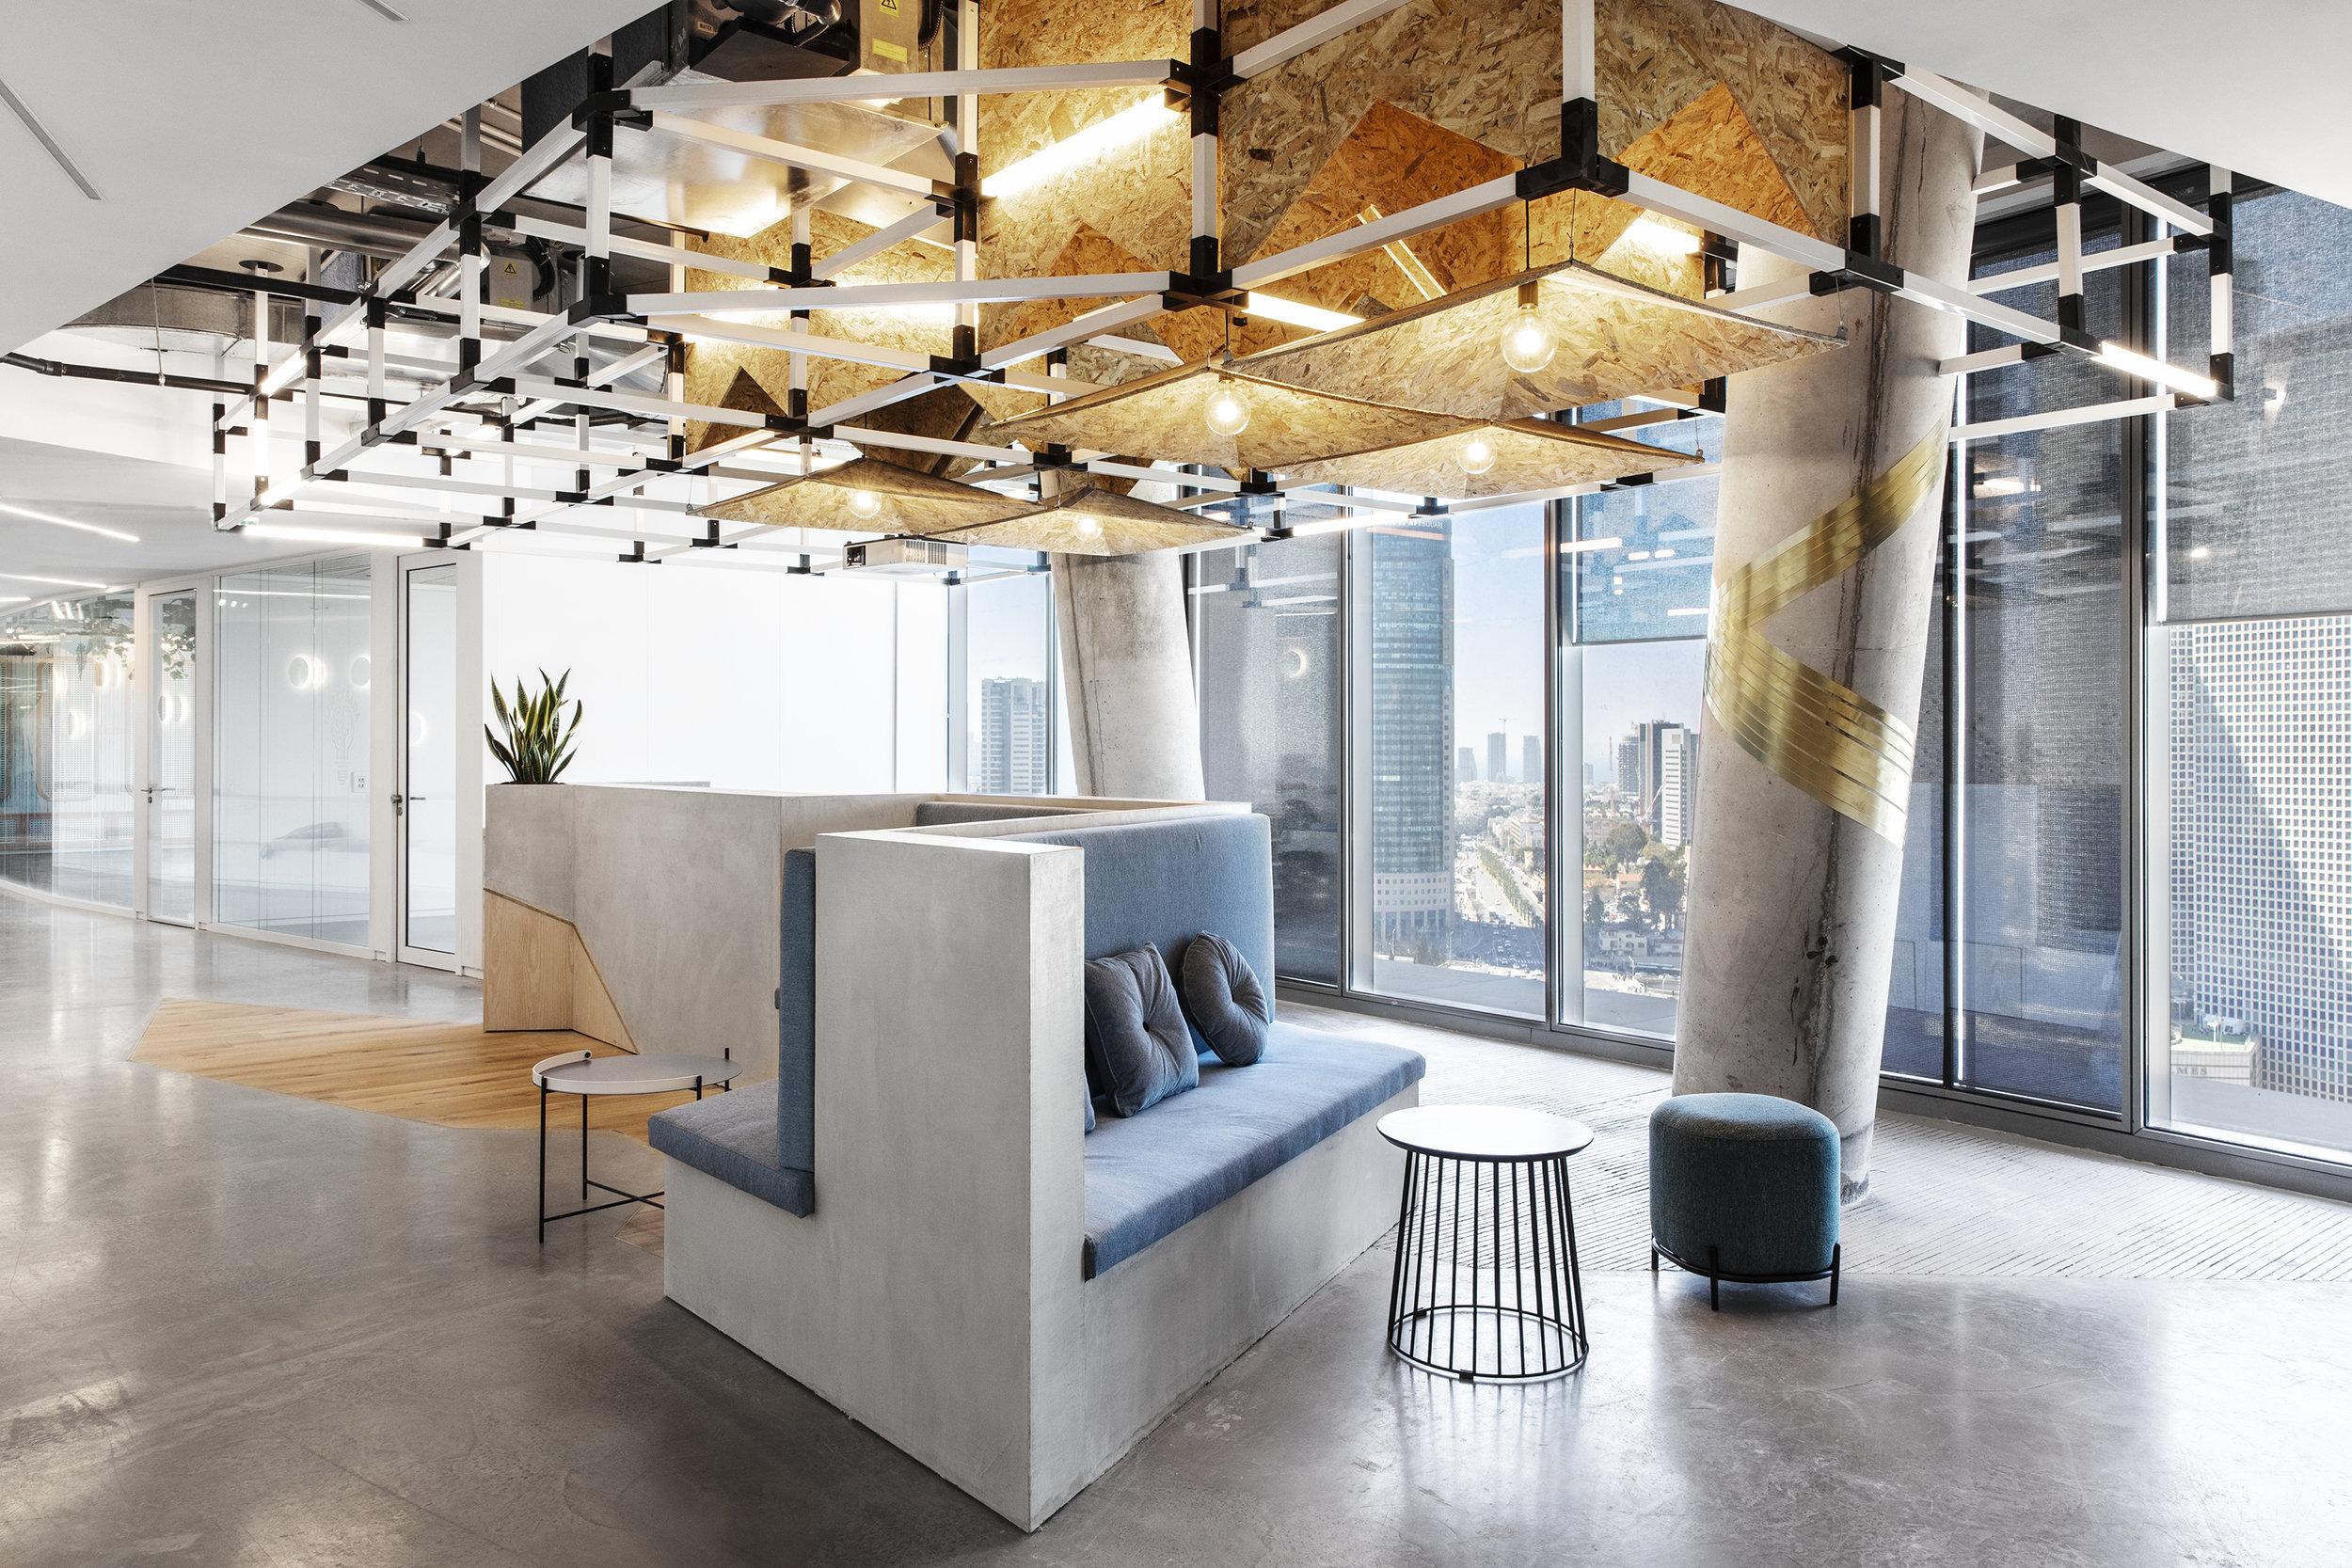 רואי דוד אדריכלות - אדריכל - נטורל אינטליג'נס - ROY DAVID - ARCHITECTURE - ARCHITECT - NI (61).jpg